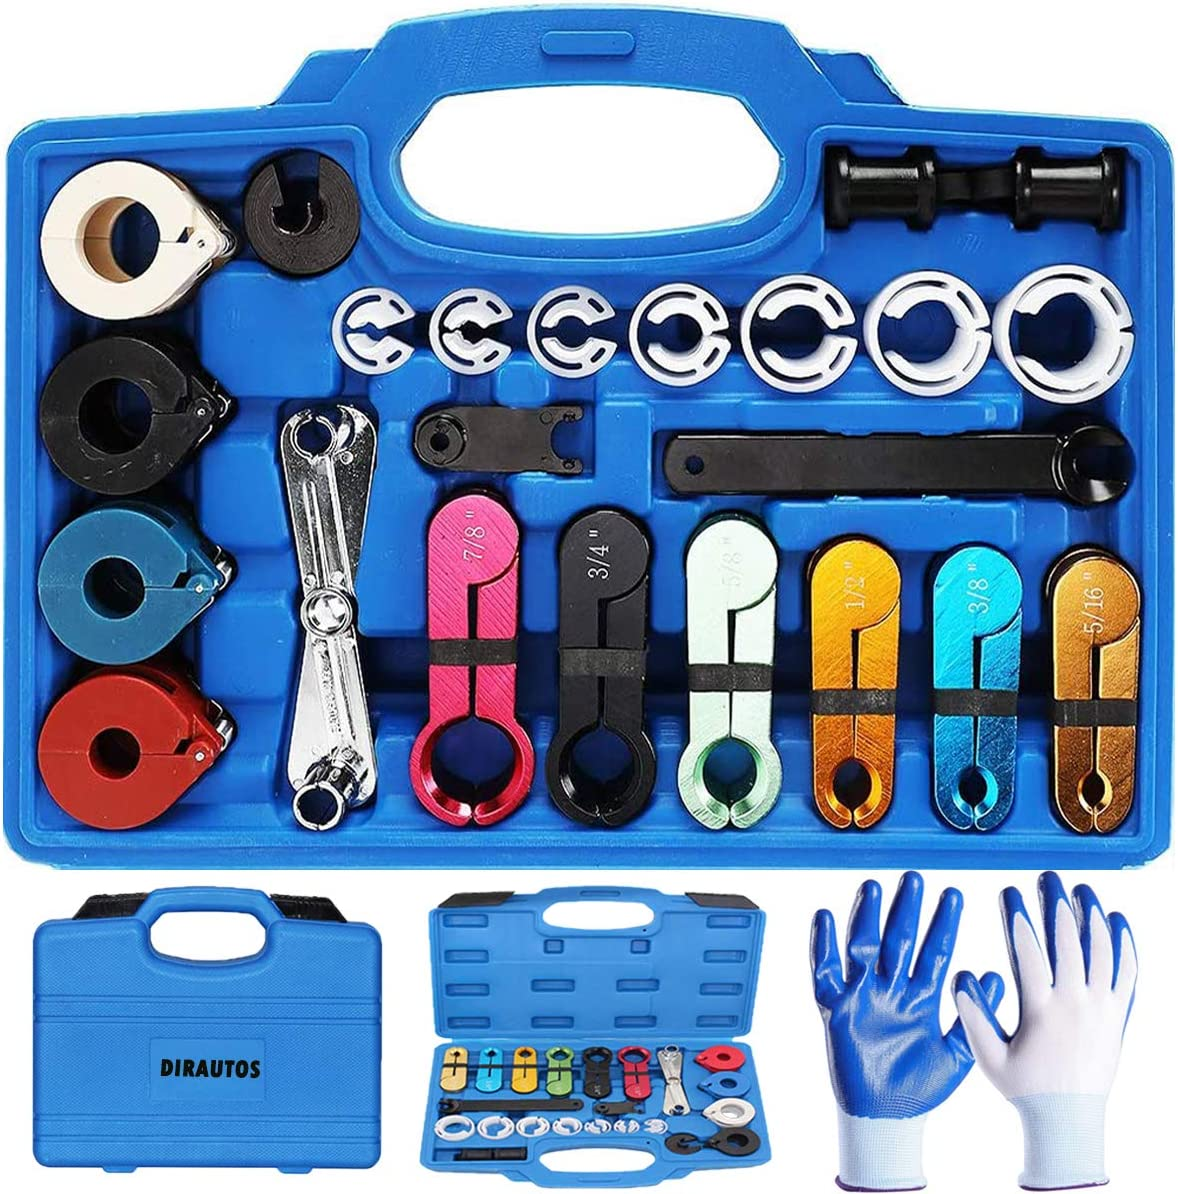 Dirautos Master Disconnecting Tool Kit